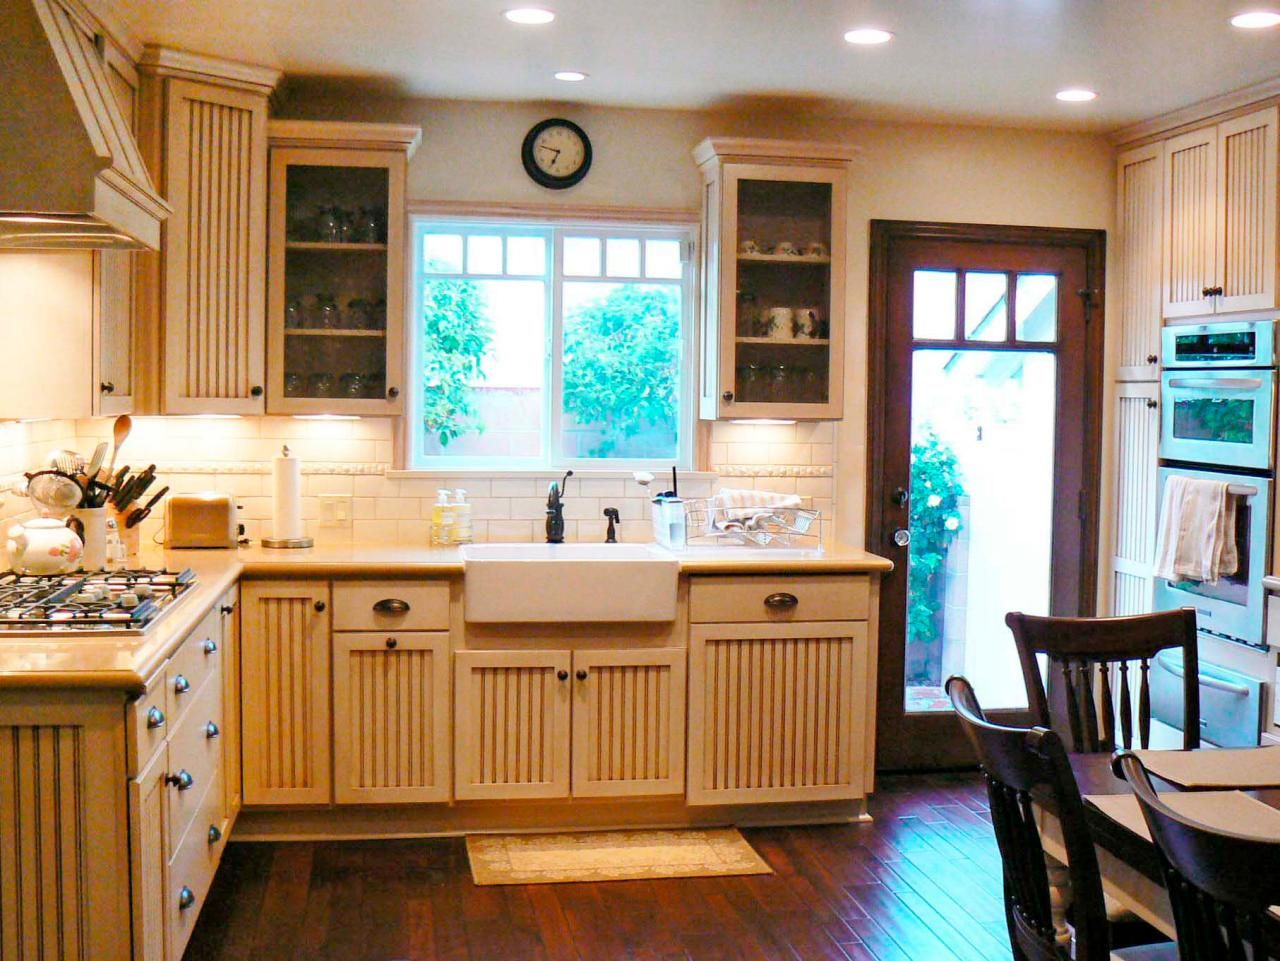 u shaped kitchens cottage kitchens kitchen layout kitchen design small on t kitchen layout id=36061